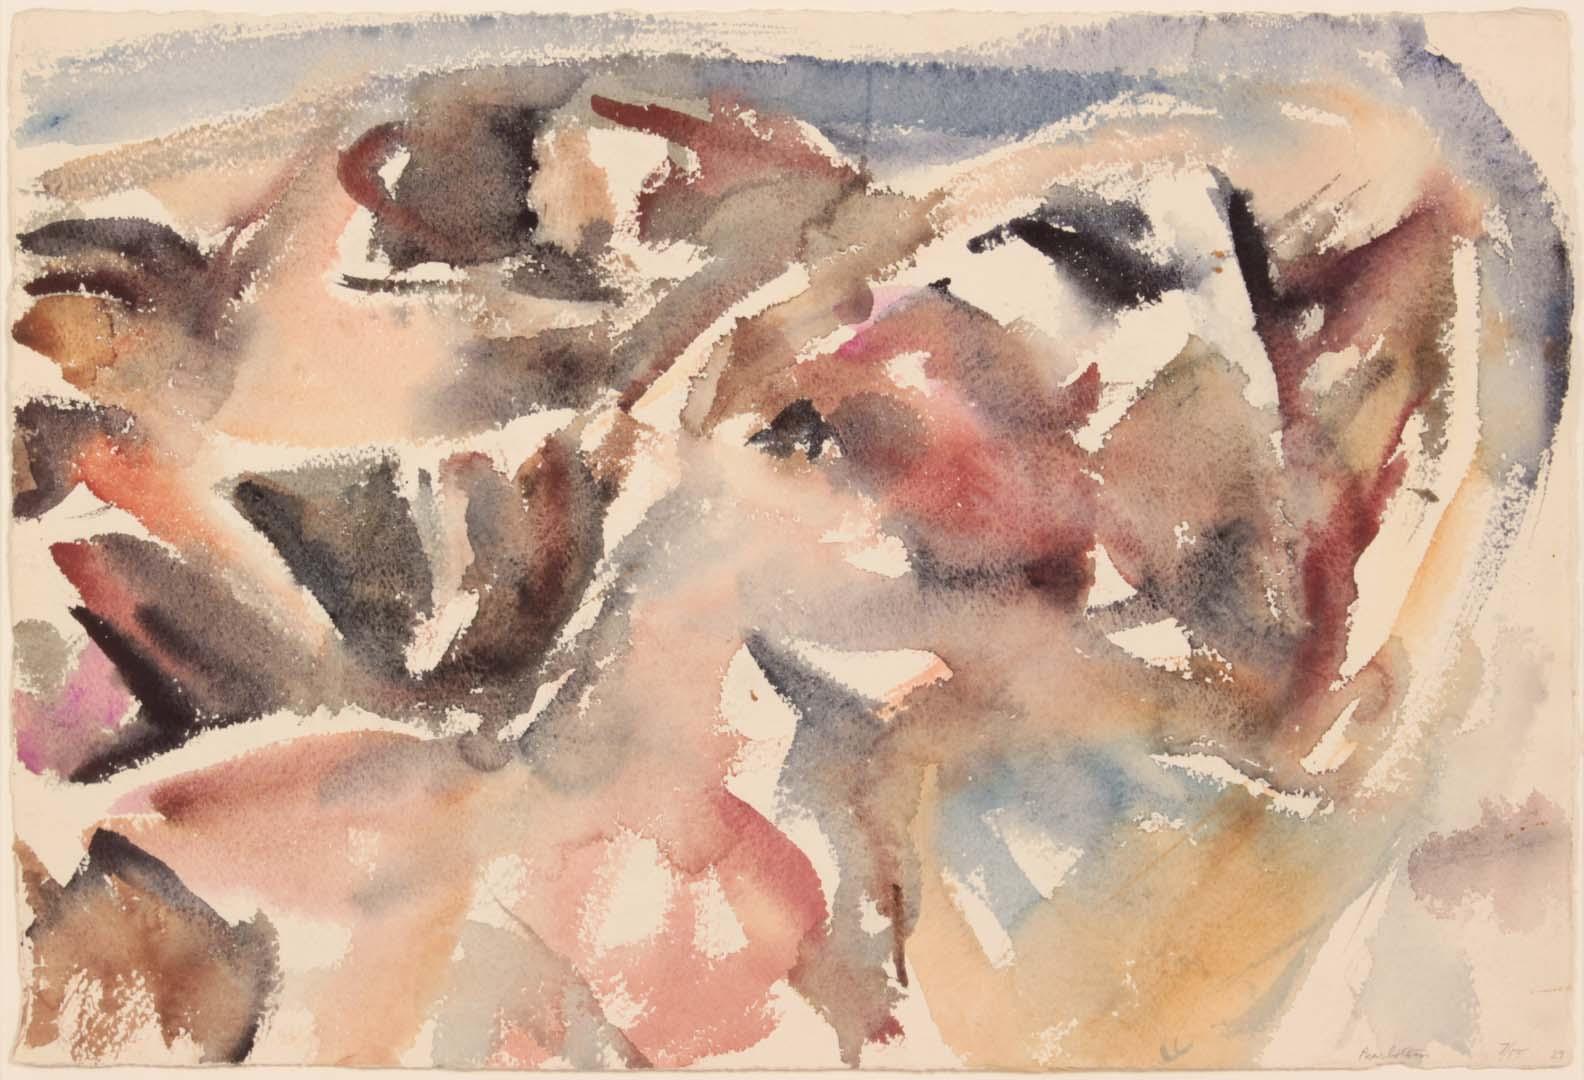 1955 Montauk Rocks #7 Watercolor on Paper 14.875 x 22